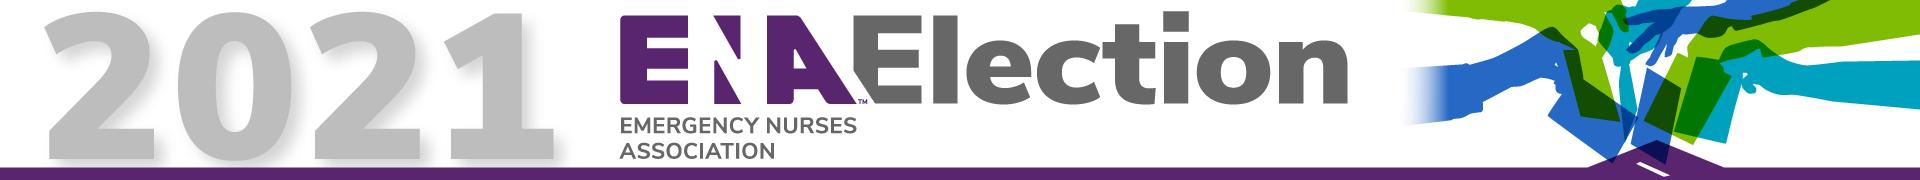 ENA Board of Directors Application Event Banner